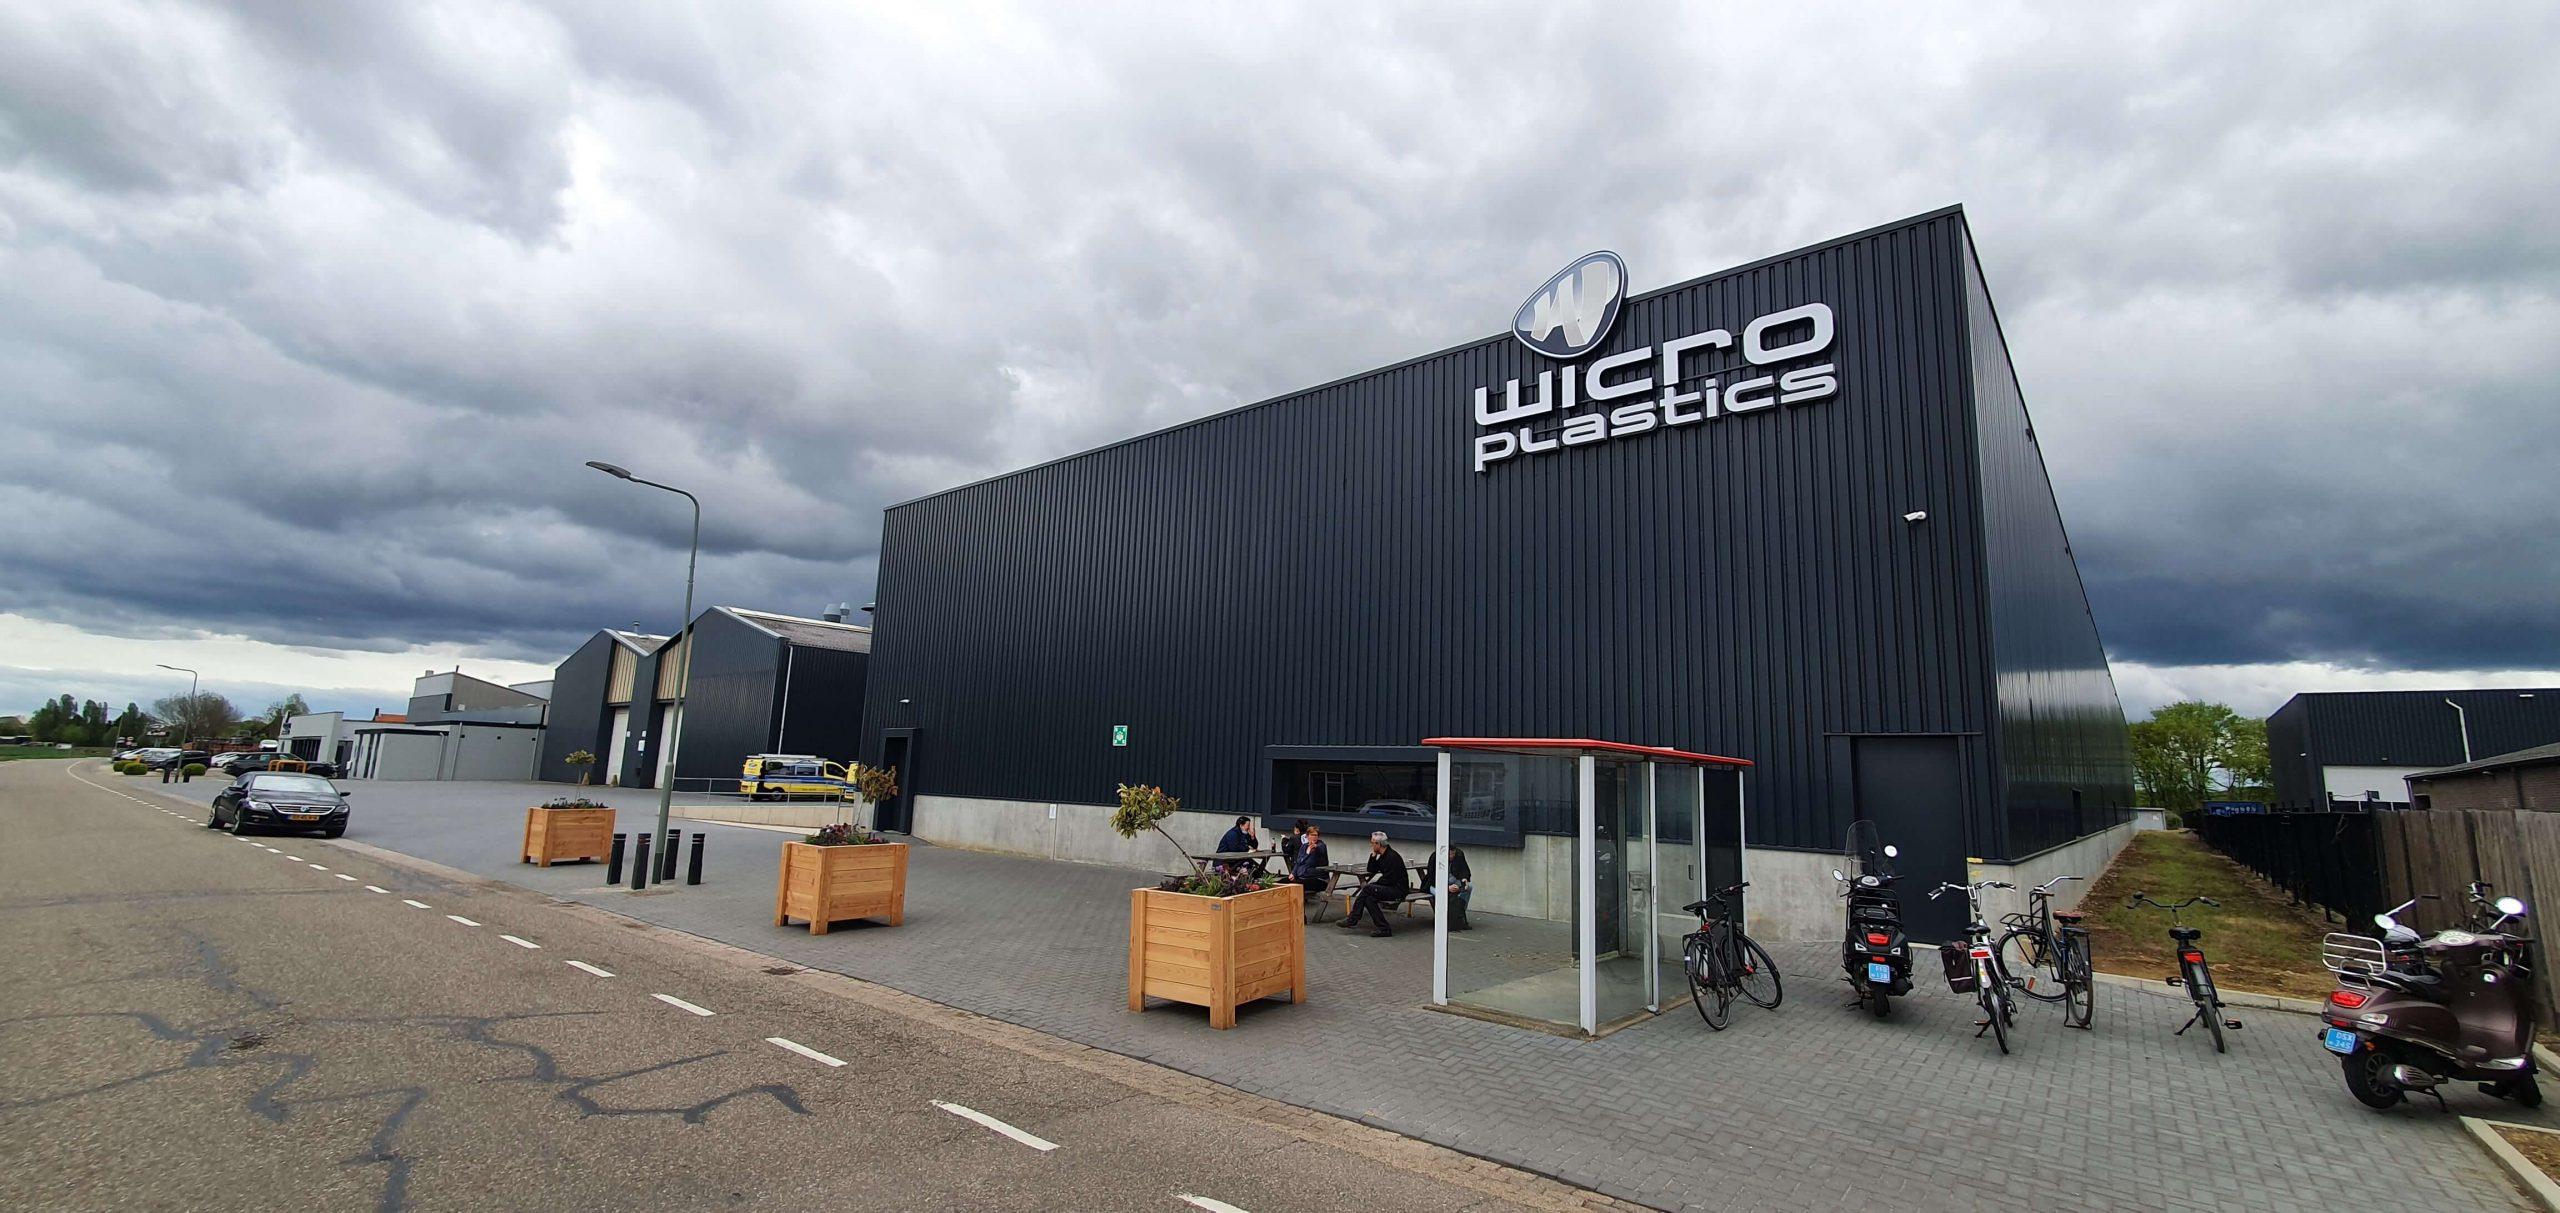 Gevelreclame bedrijfshal Wicro 4